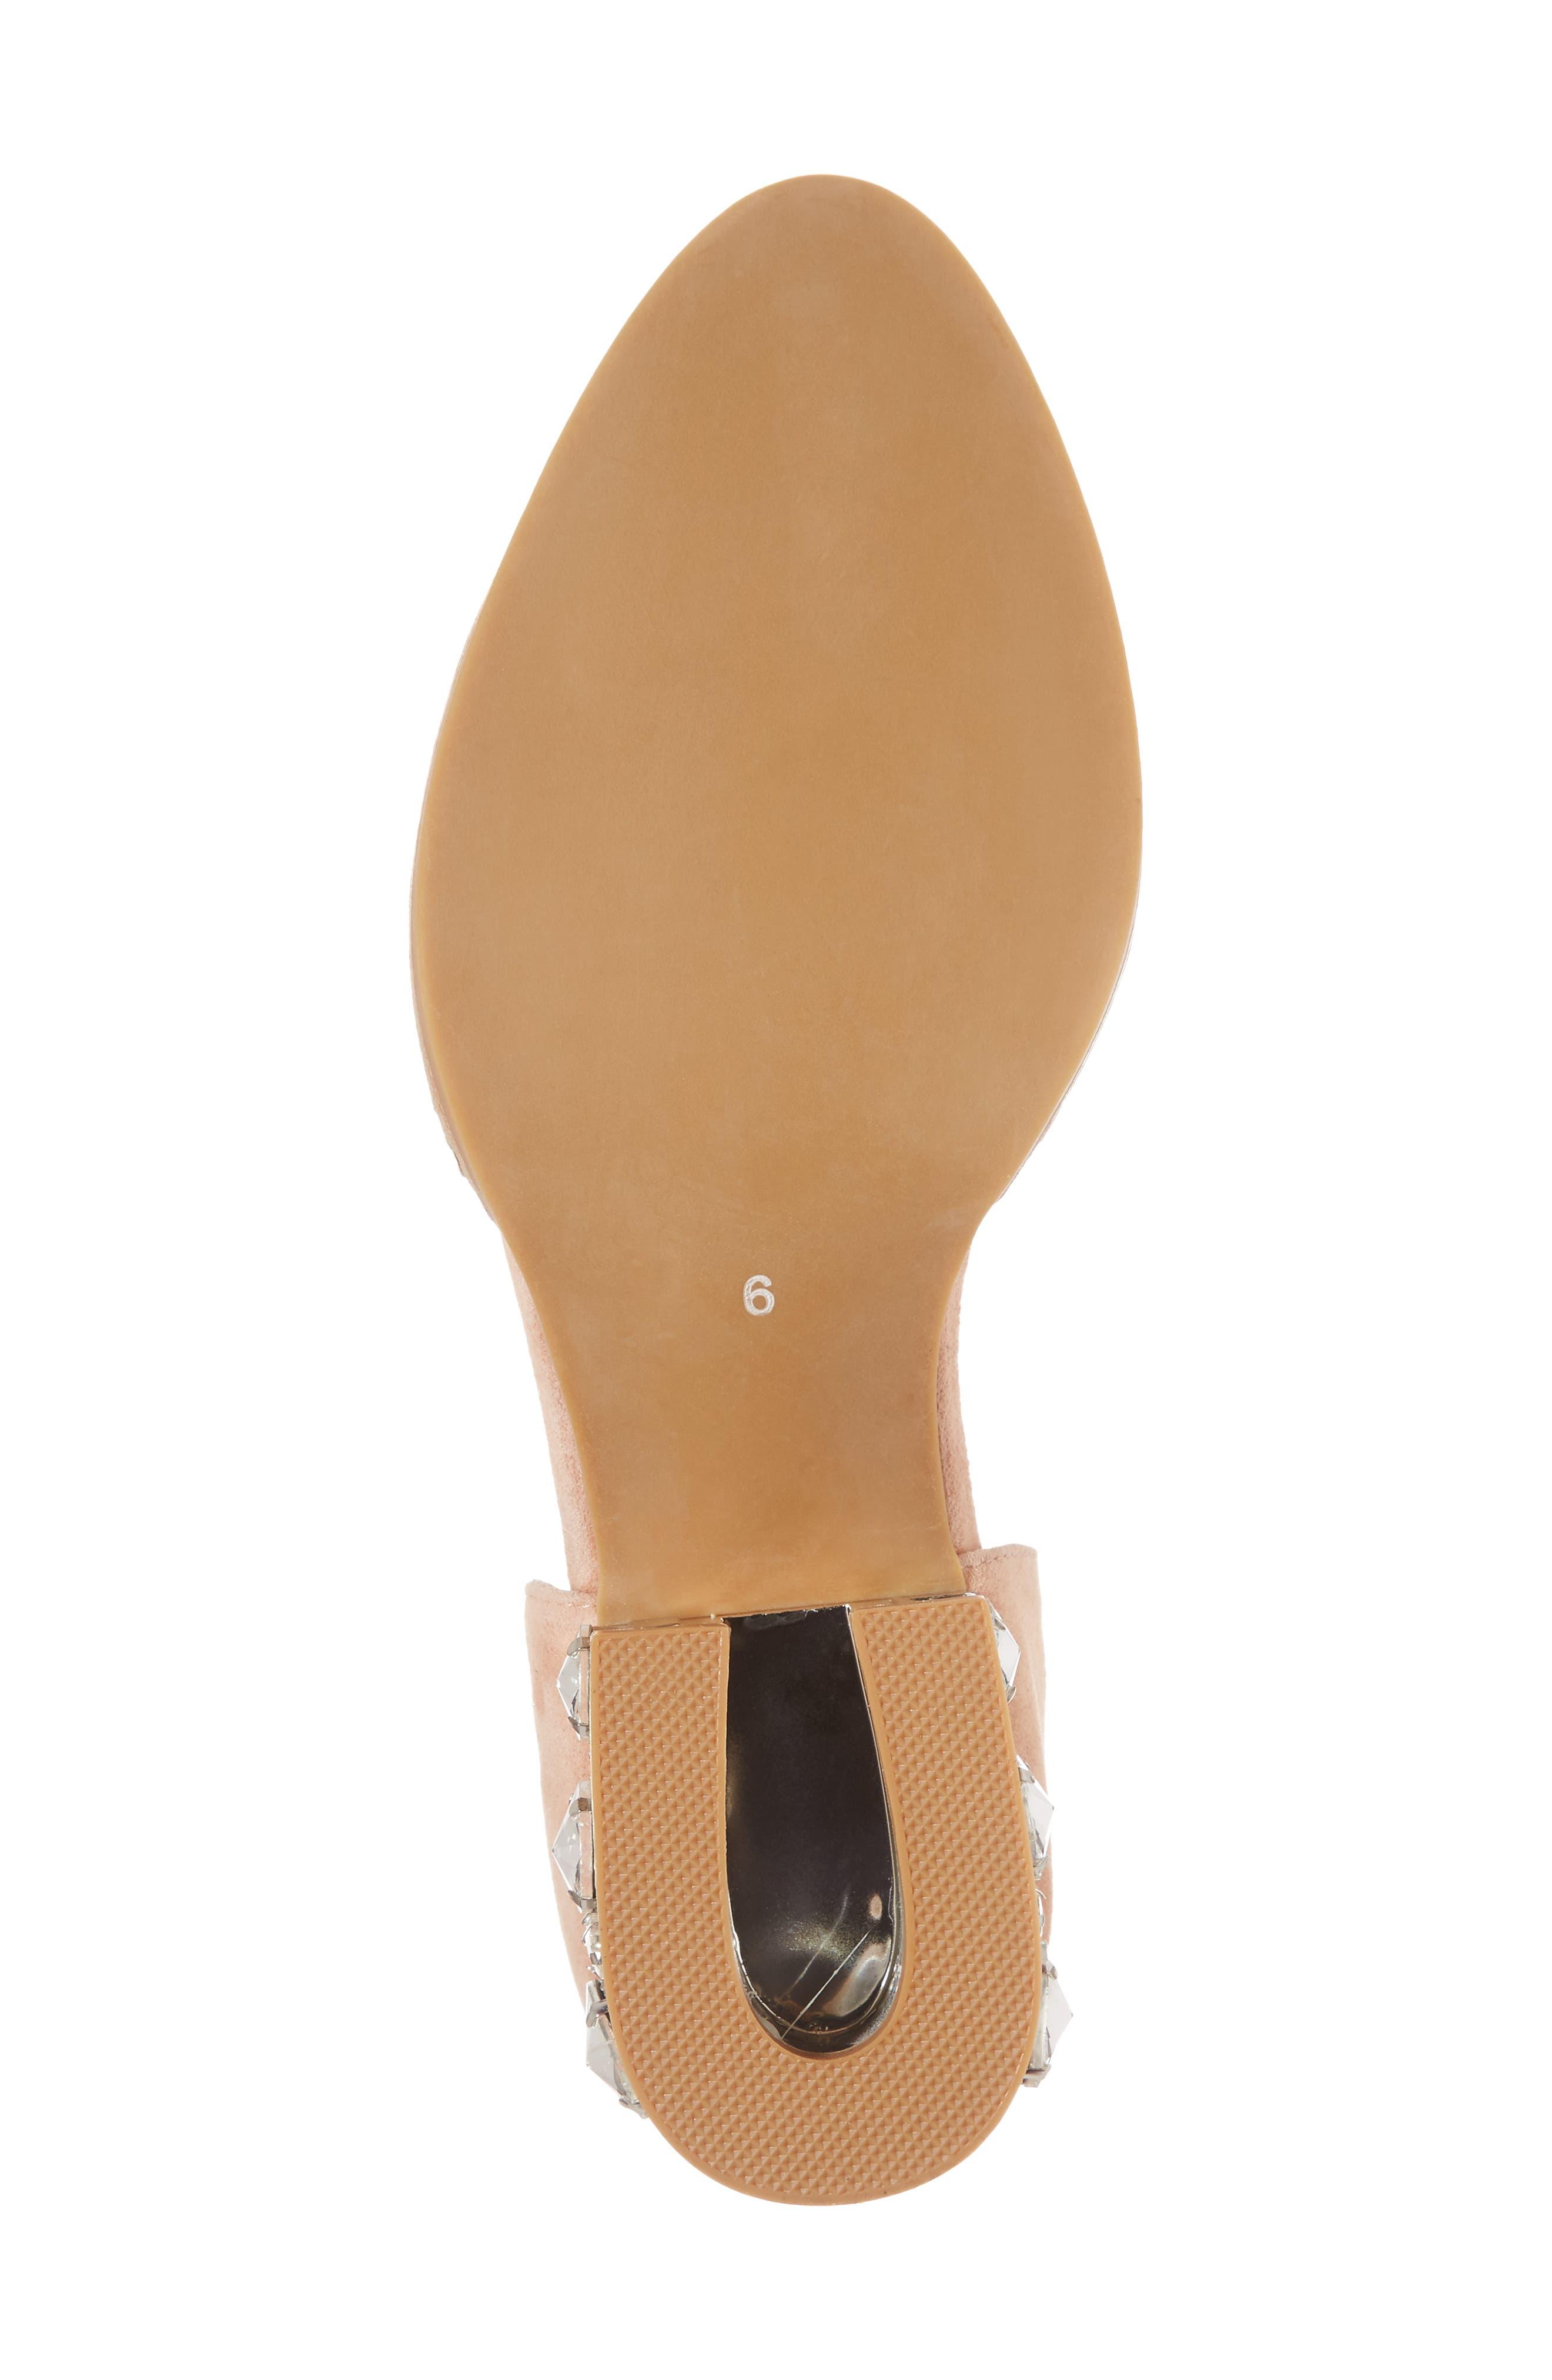 Civil Studded Loafer,                             Alternate thumbnail 6, color,                             Blush/ Silver Suede